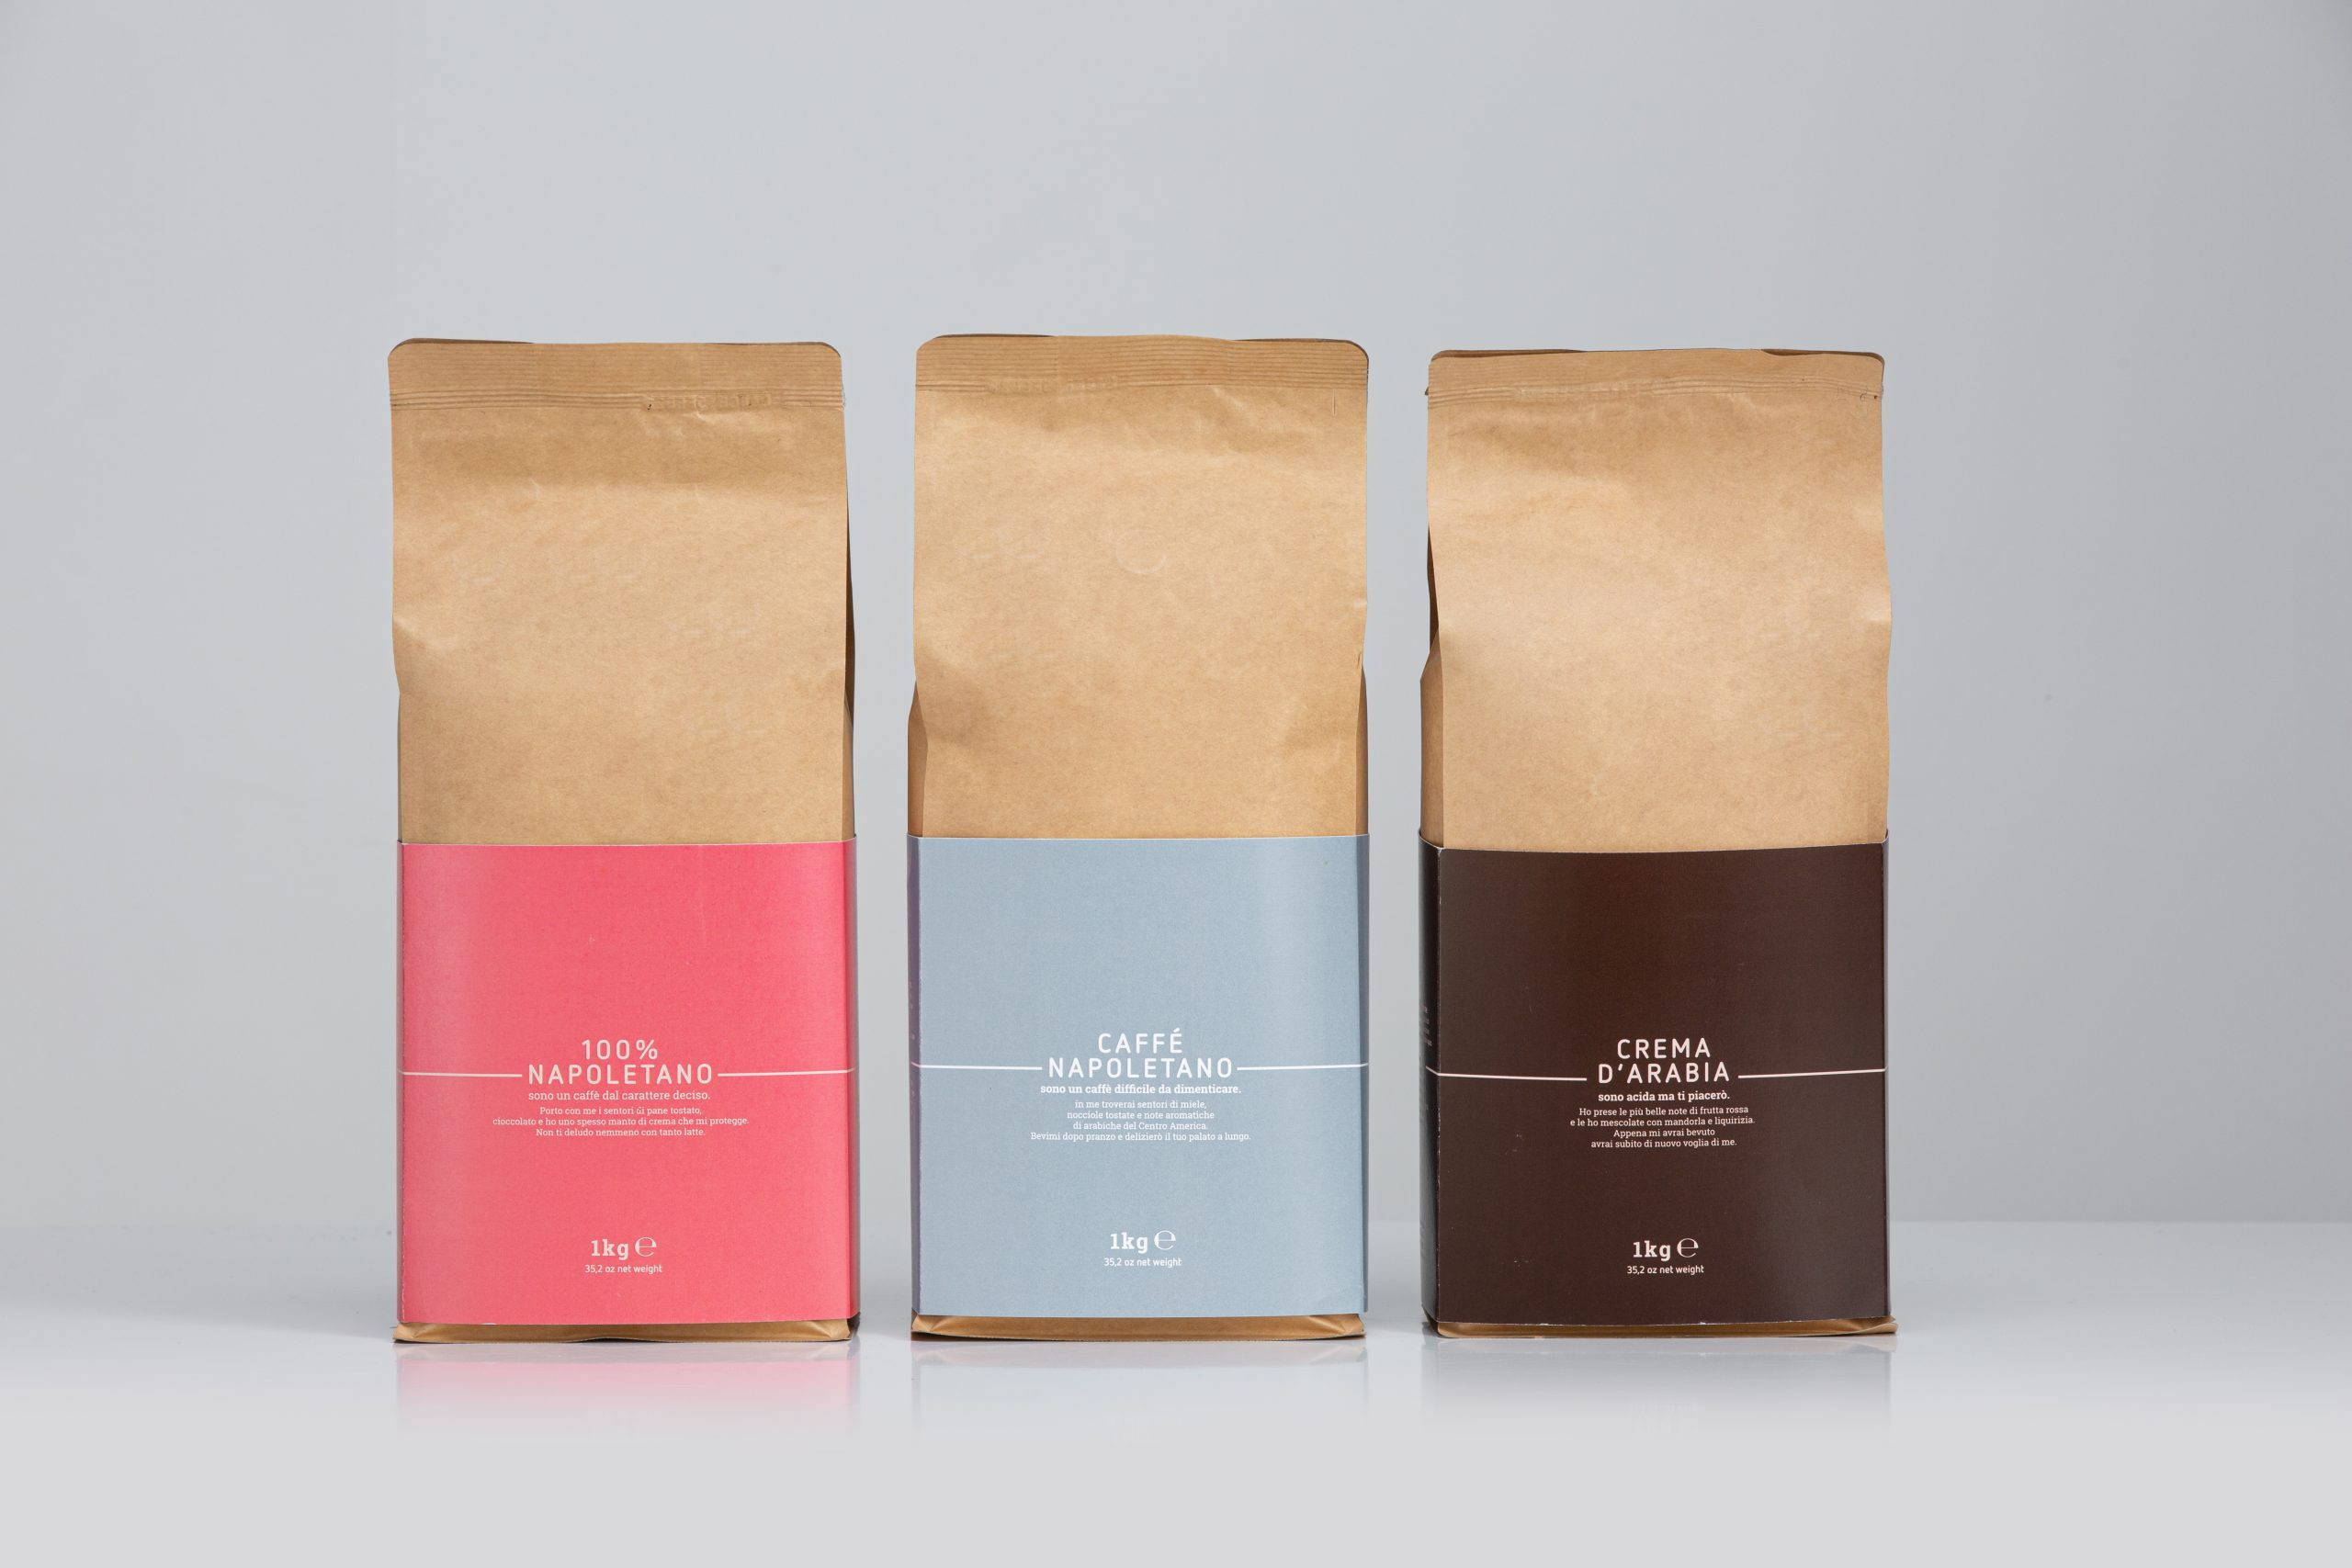 Nurri coffee blends napoletano arabia 1kg